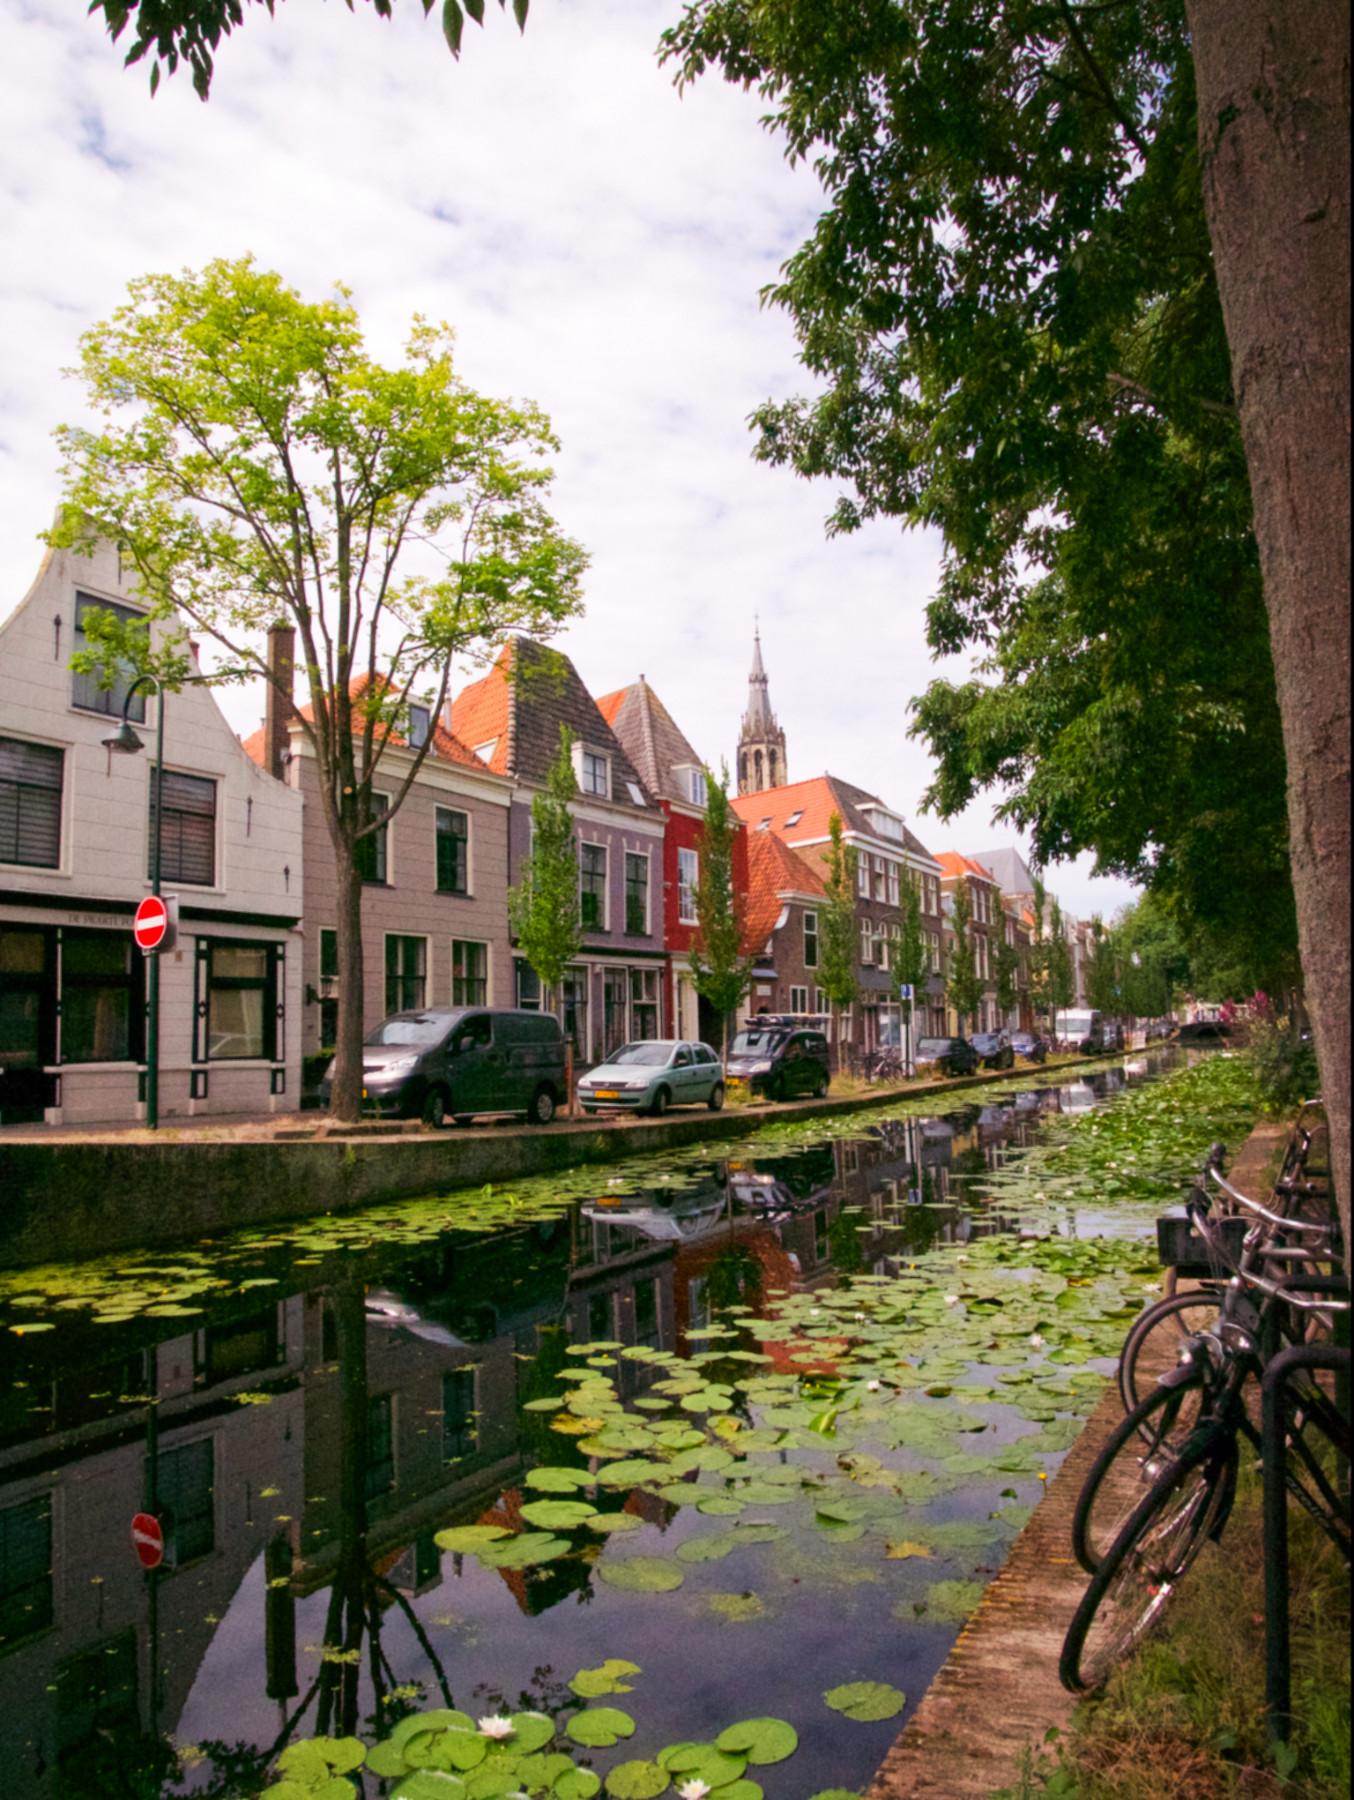 058-Nederland-Delft